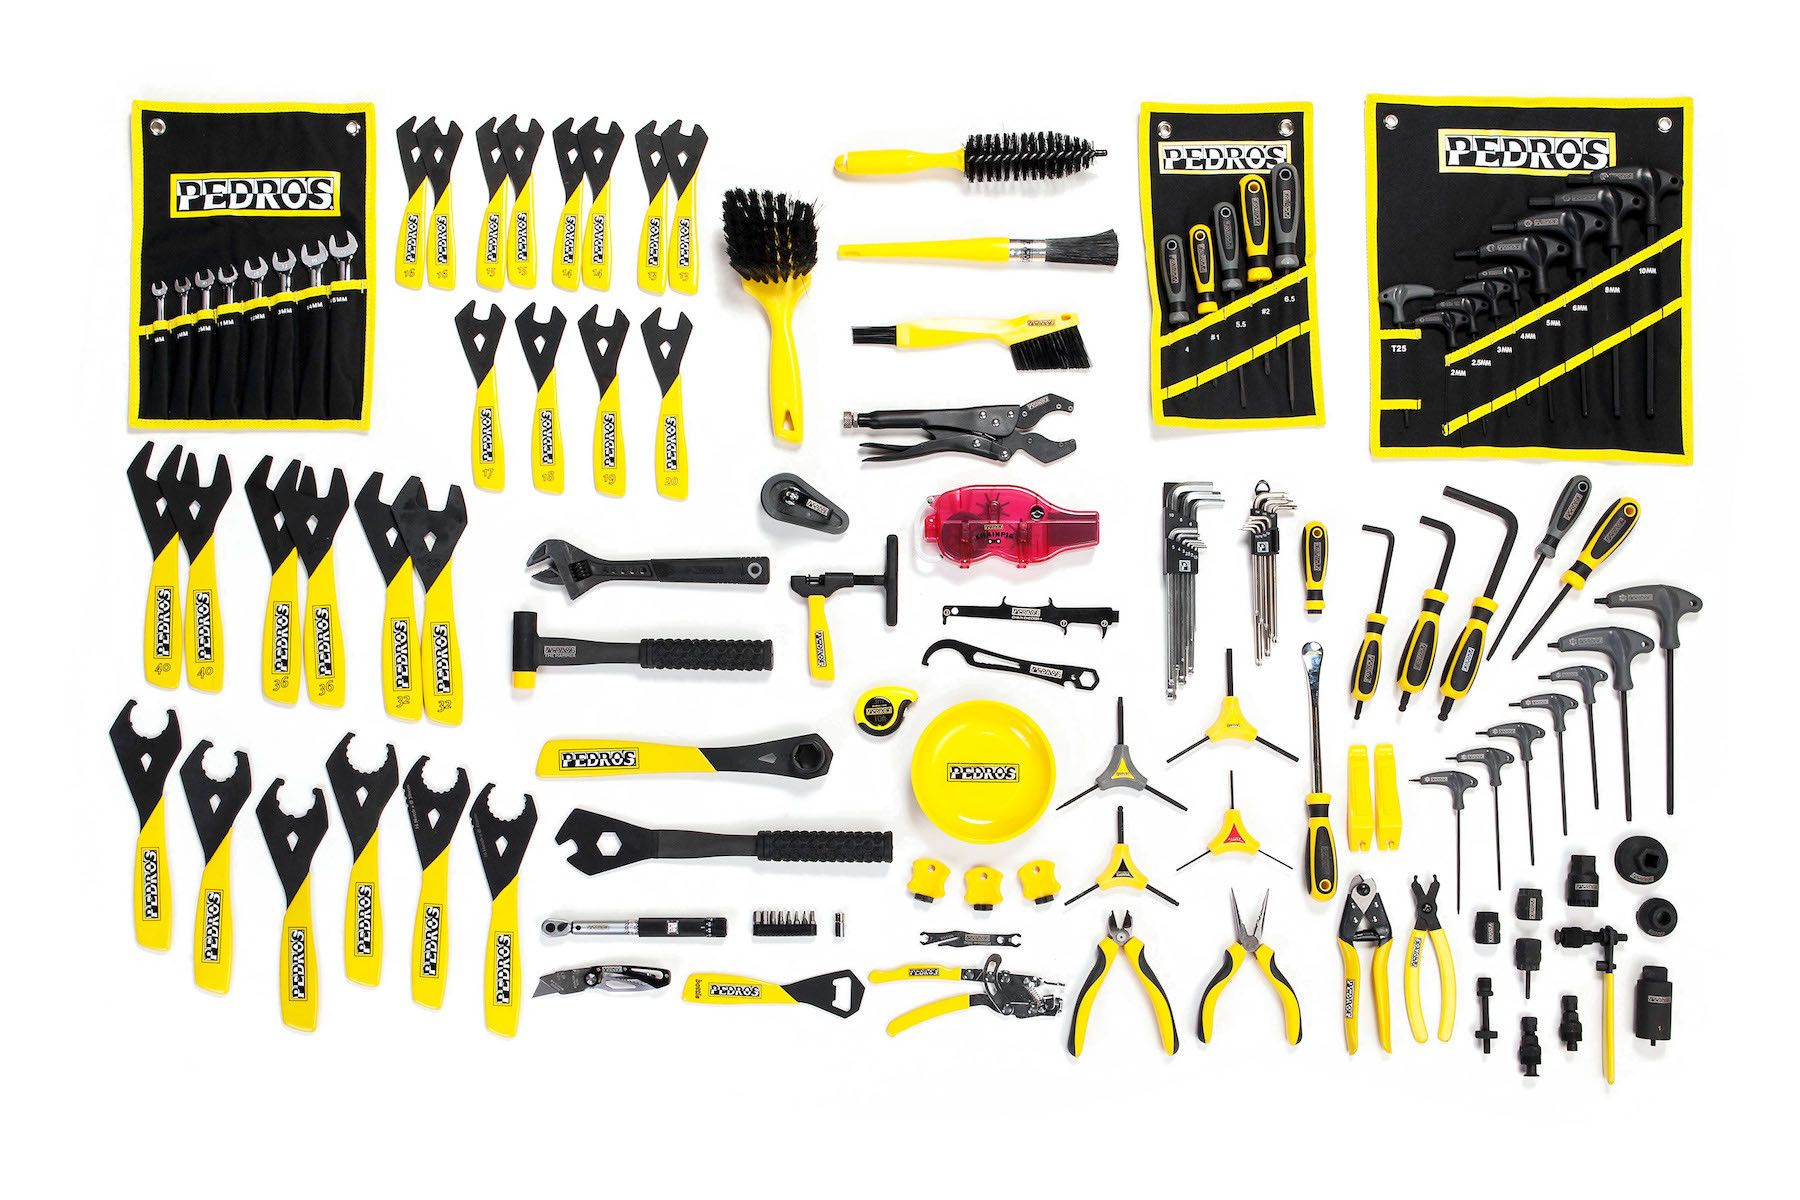 Master Bench Tool Kit de Pedro´s